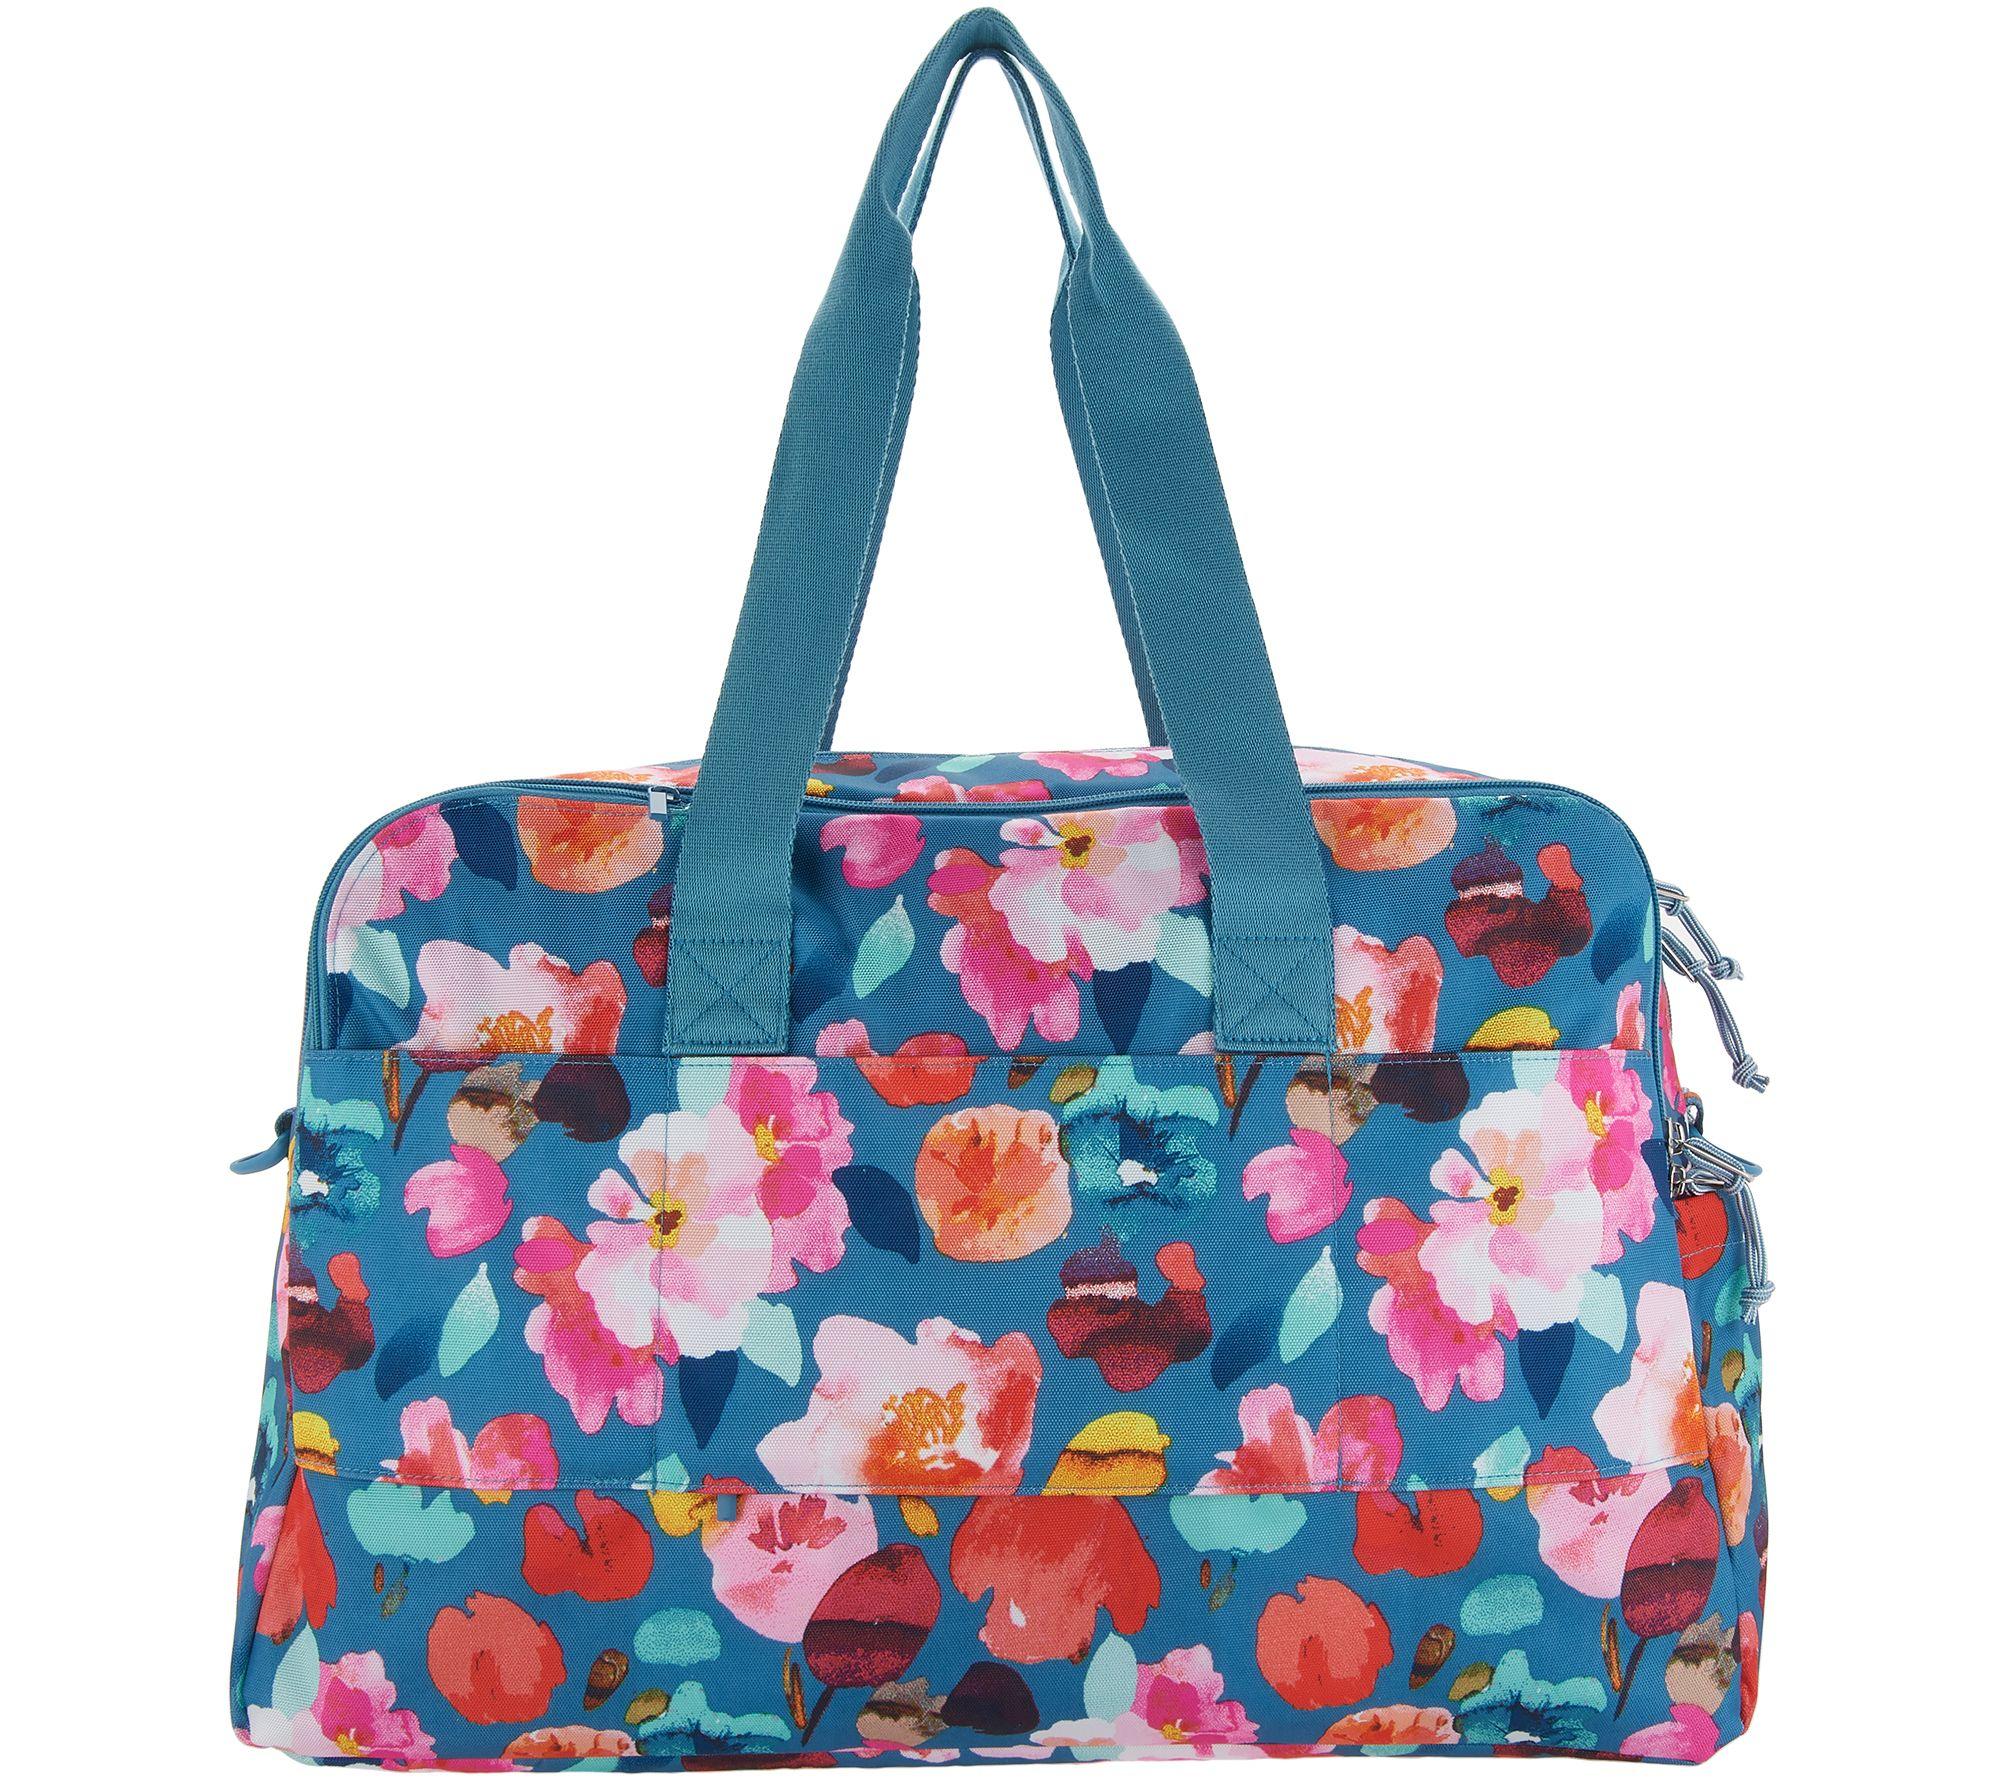 317fbca20cf6 Vera Bradley Lighten Up Weekender Travel Bag w  Cosmetic Case - Page ...